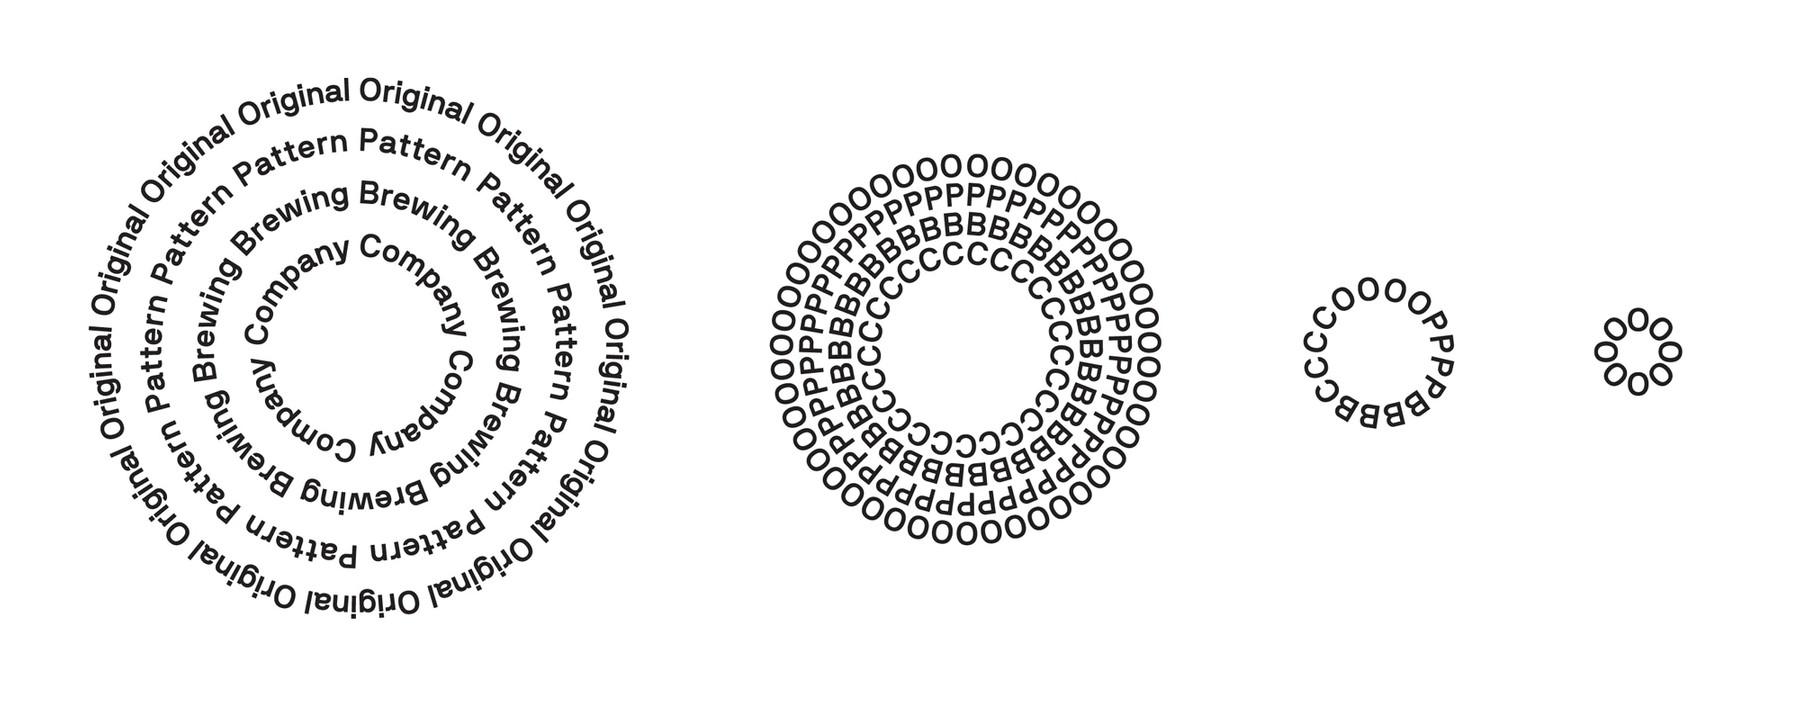 original_pattern_brewing_logo_system-1.png